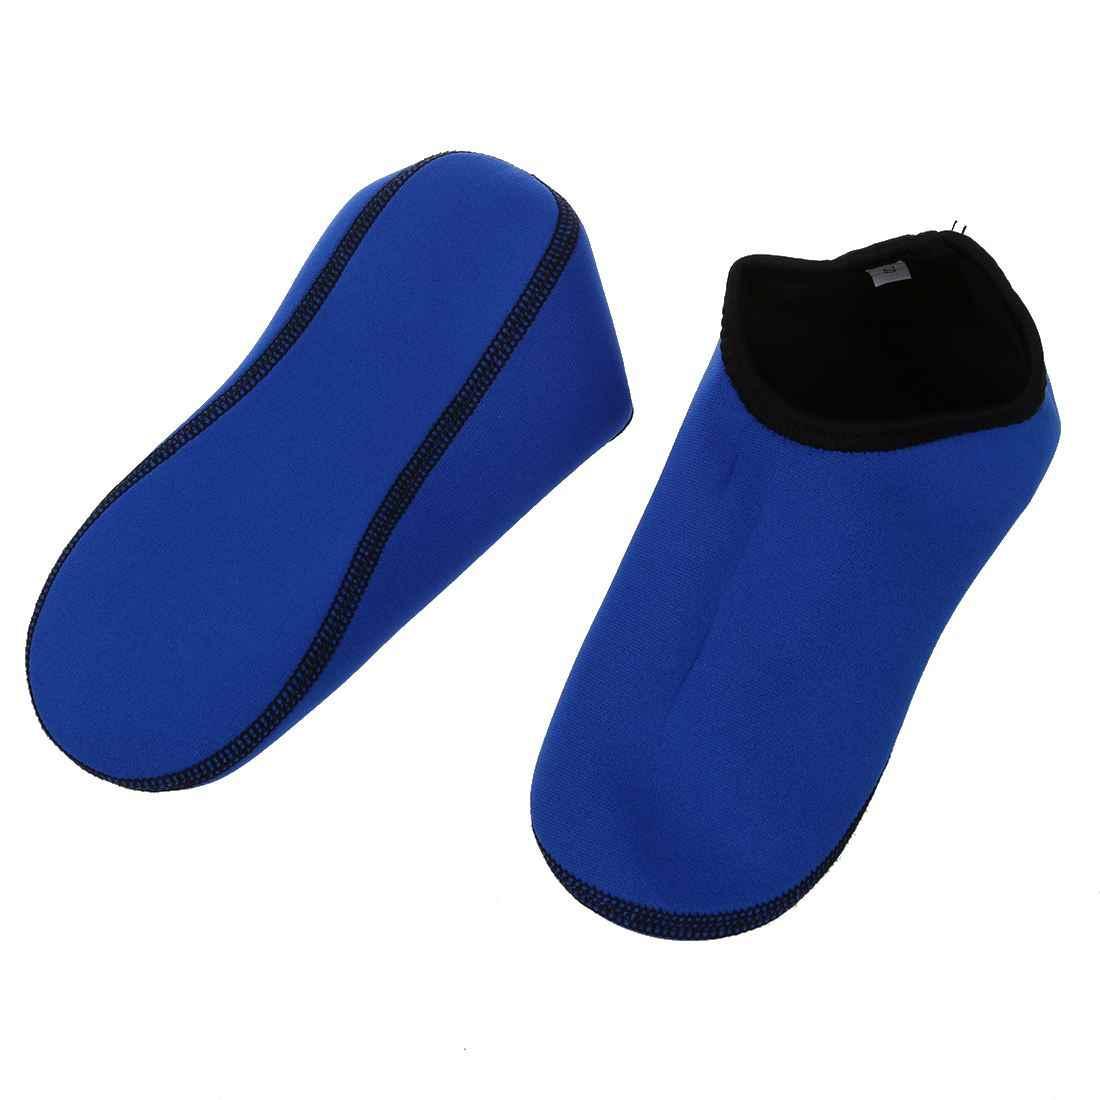 2.5mm Neopren Su Sporları Yüzme Cilt Scuba Dalış Sörf Çorap Dalış Mavi